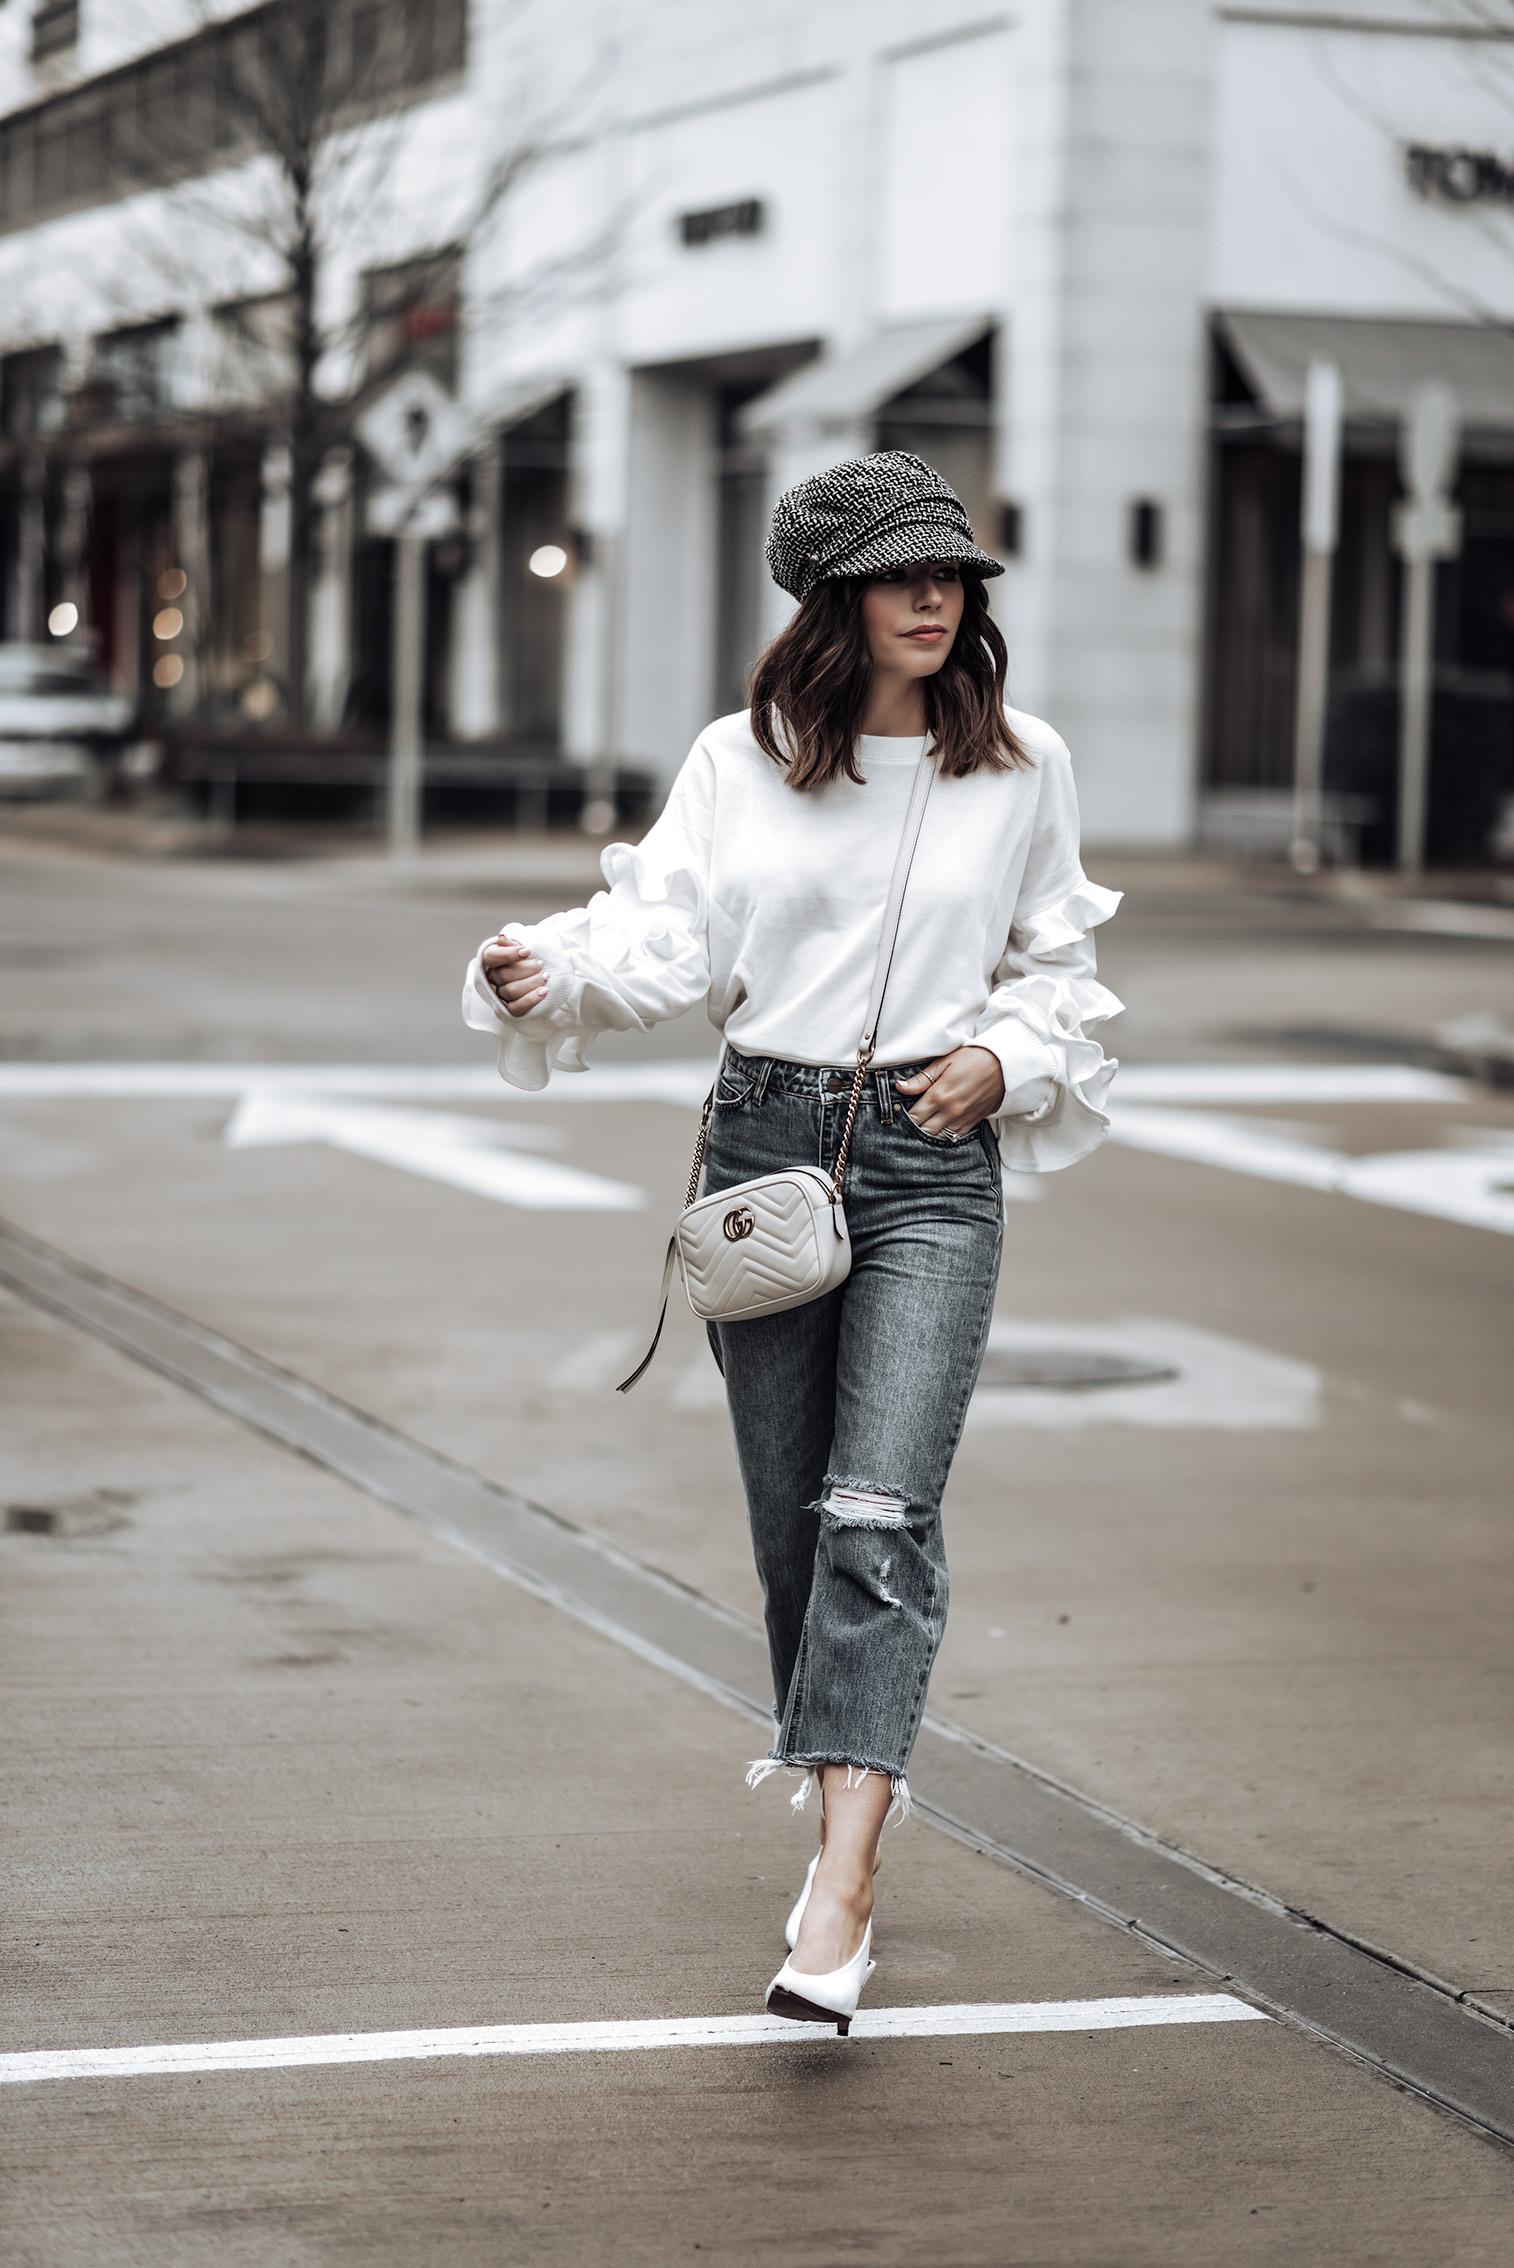 Ruffle details |Ruffle Sleeve Terry Pullover (similar) | Gucci GG Marmont bag | Jeans (similar) | Tweed Baker's Boy Cap | White Slingback Heels #bakerhat #liketkit #slingbackheels #streetstyle